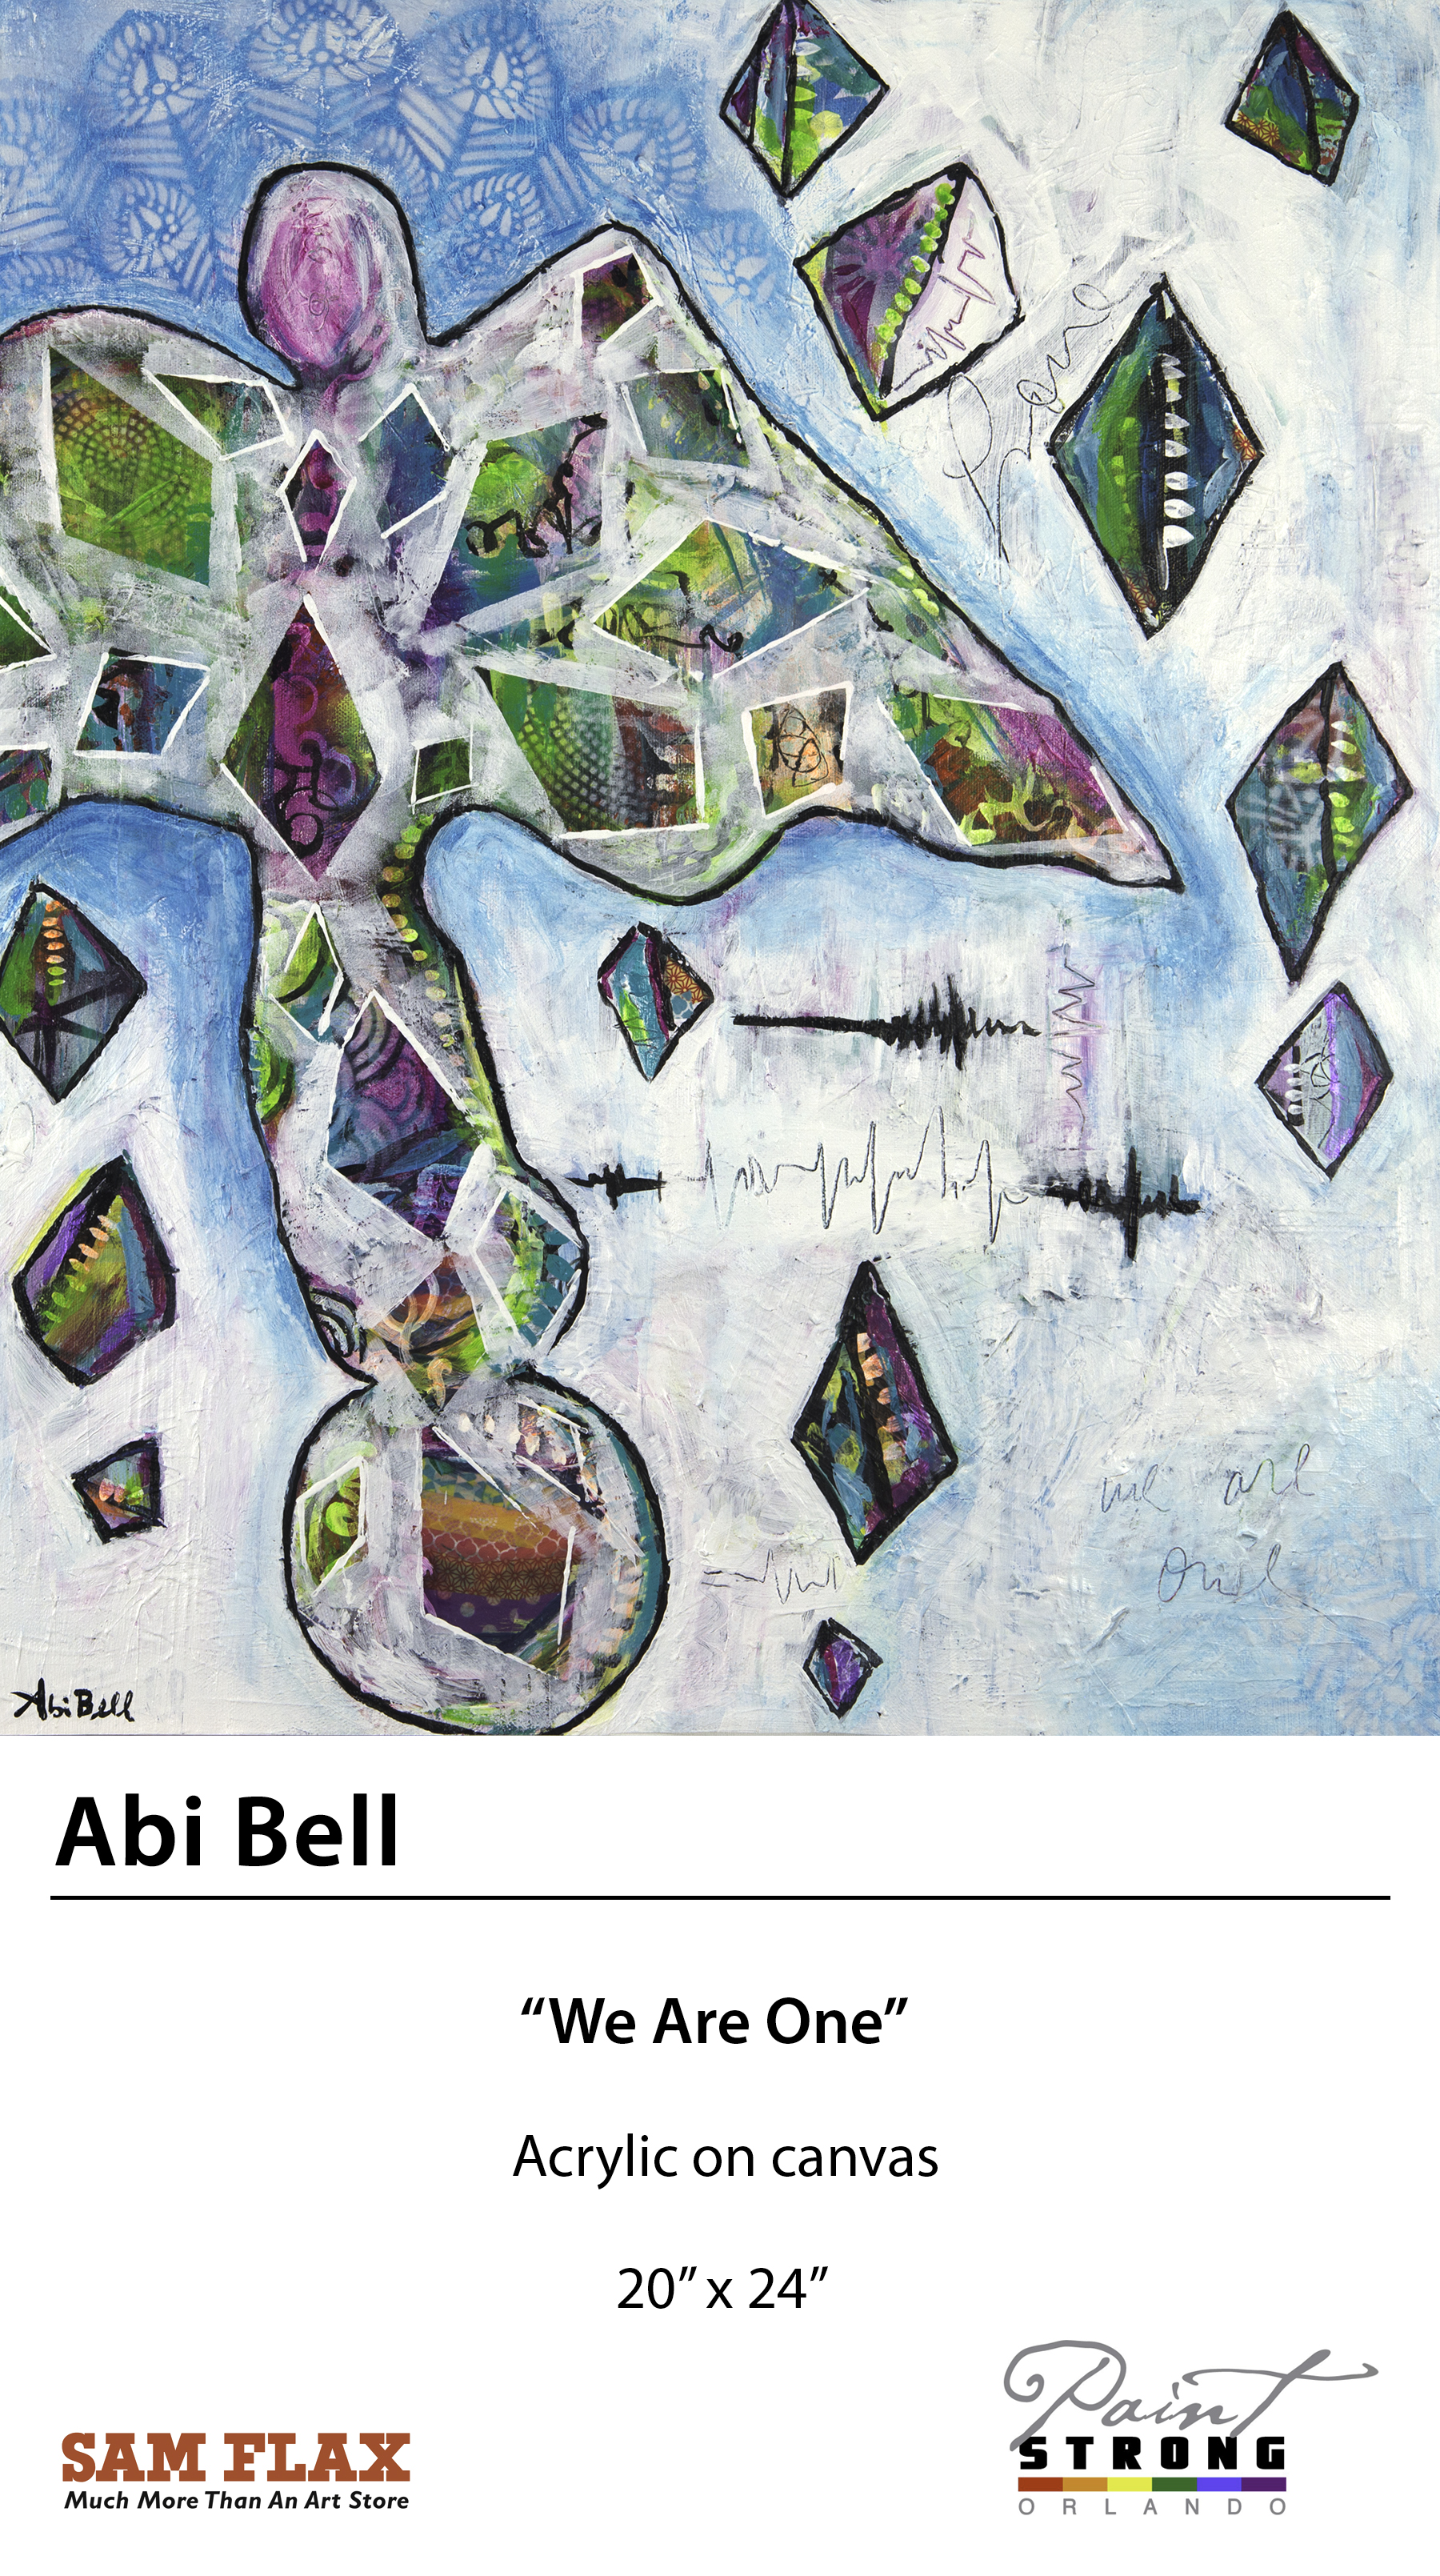 Abi Bell